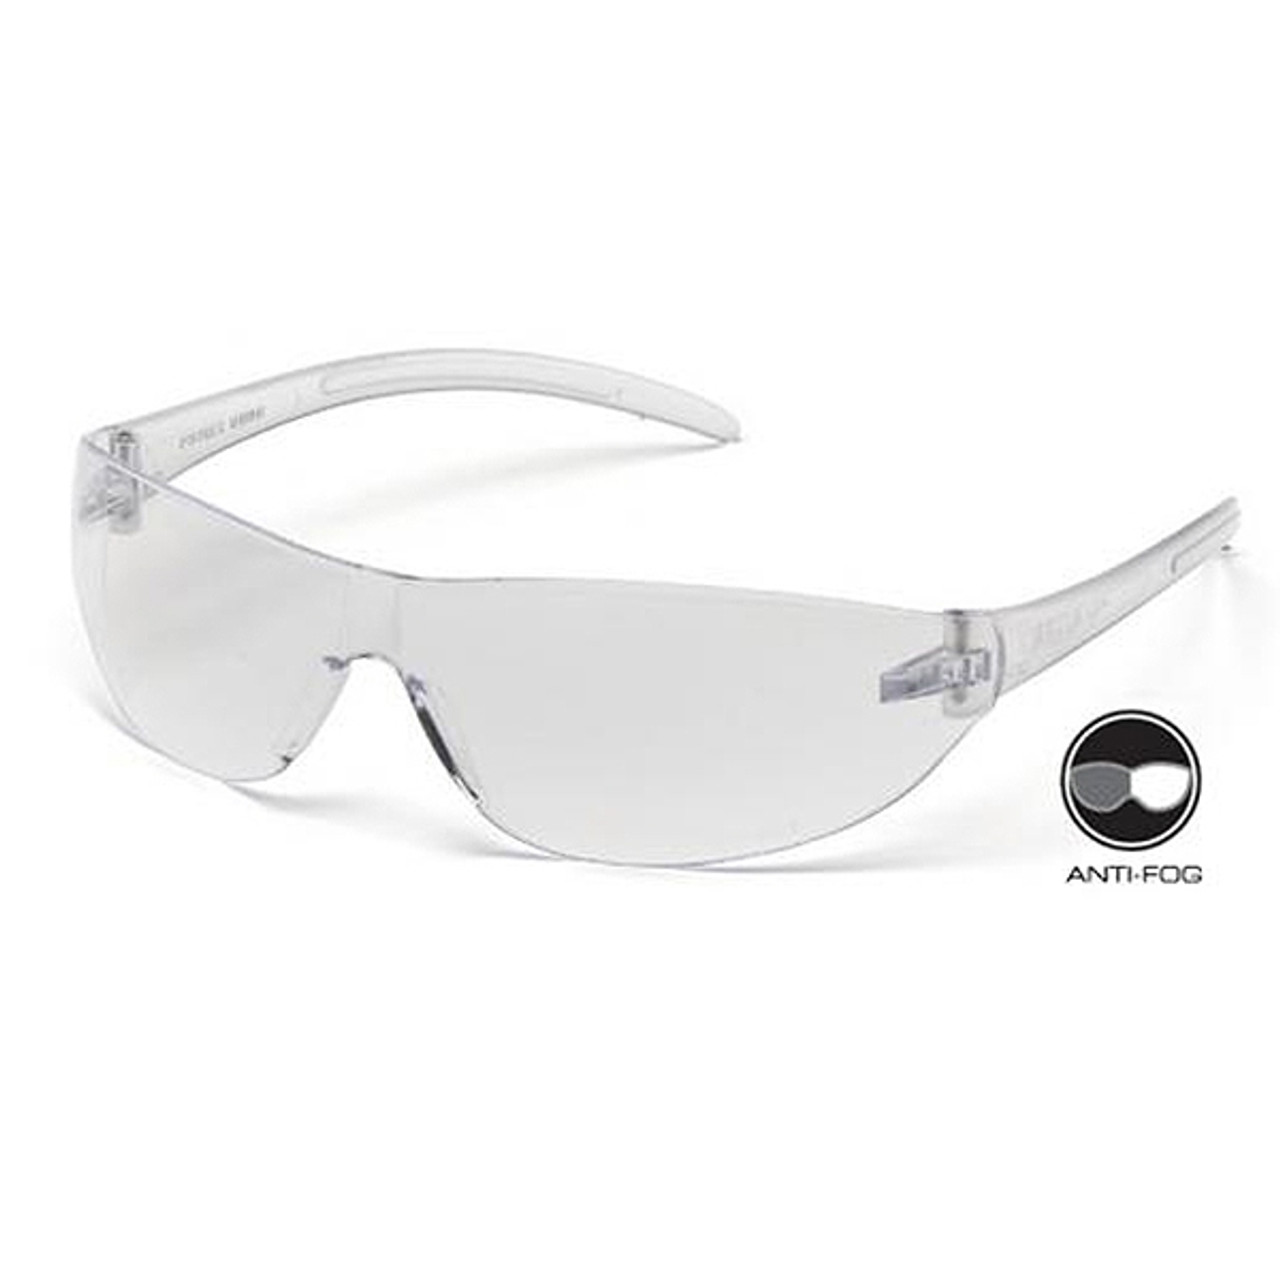 576fc7d5bdc1 Pyramex Alair Clear Anti Fog Lens Safety Glasses S3210ST